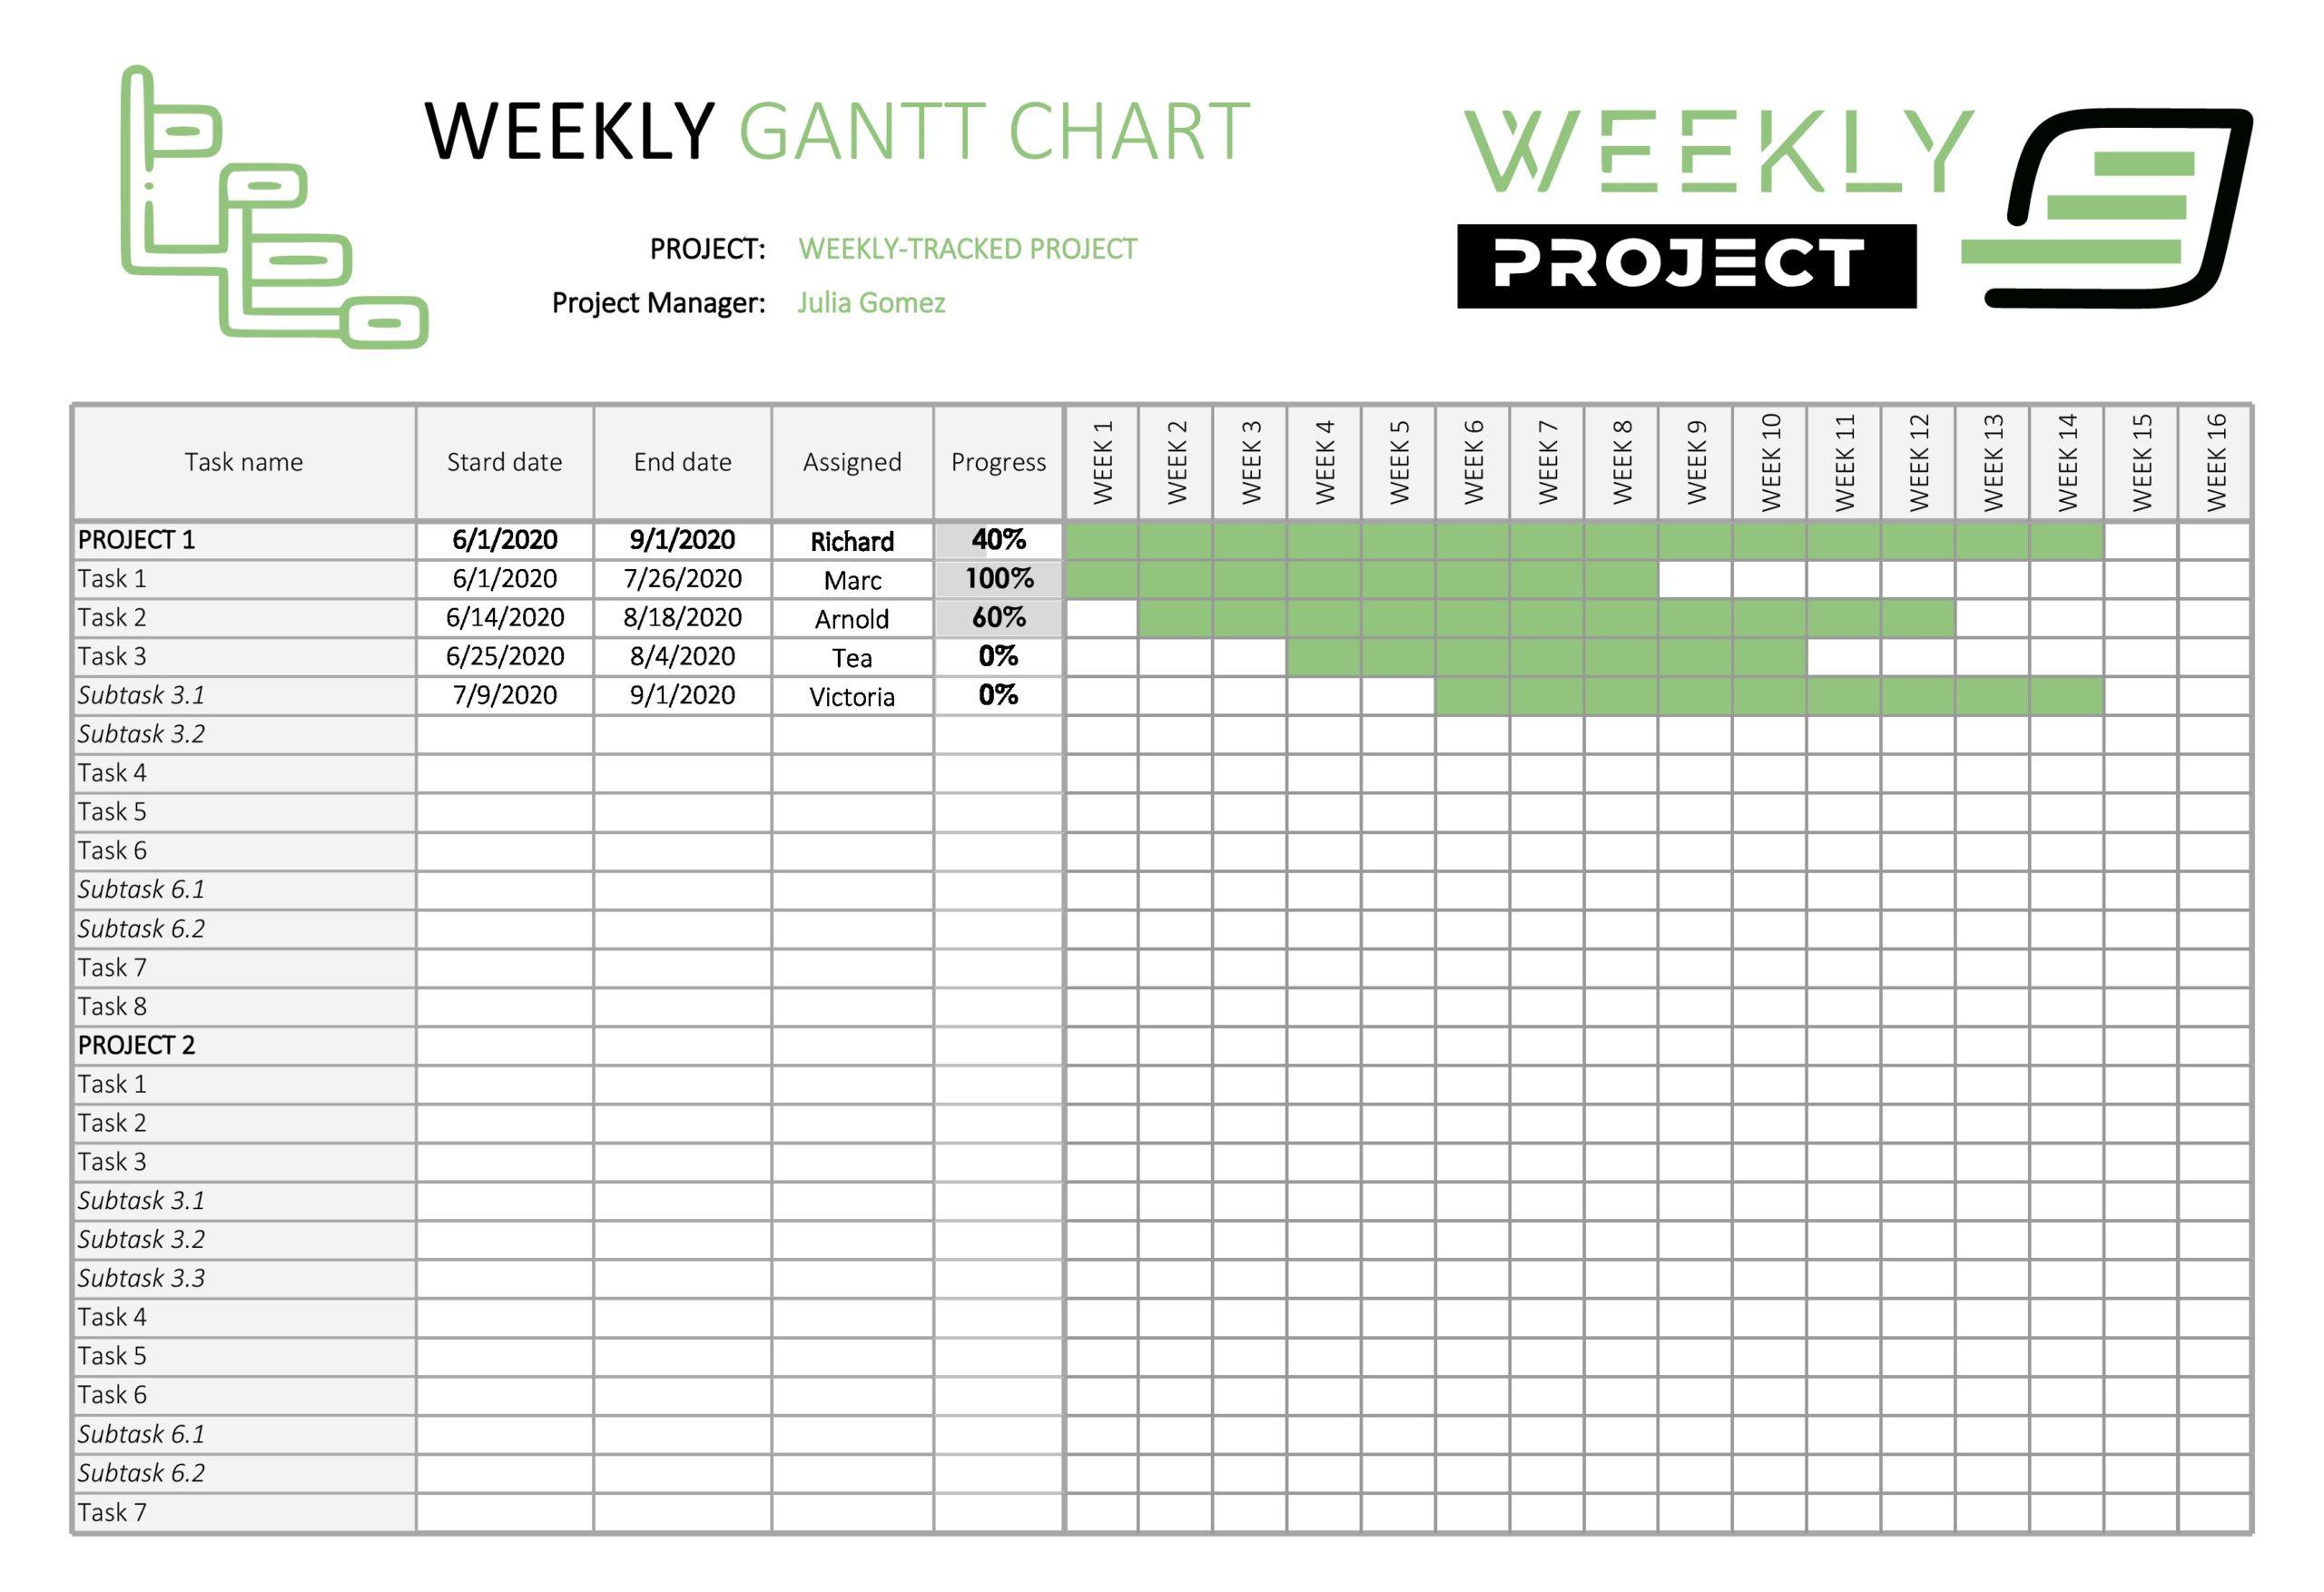 Free Weekly Gantt Chart Template - TemplateLab.com